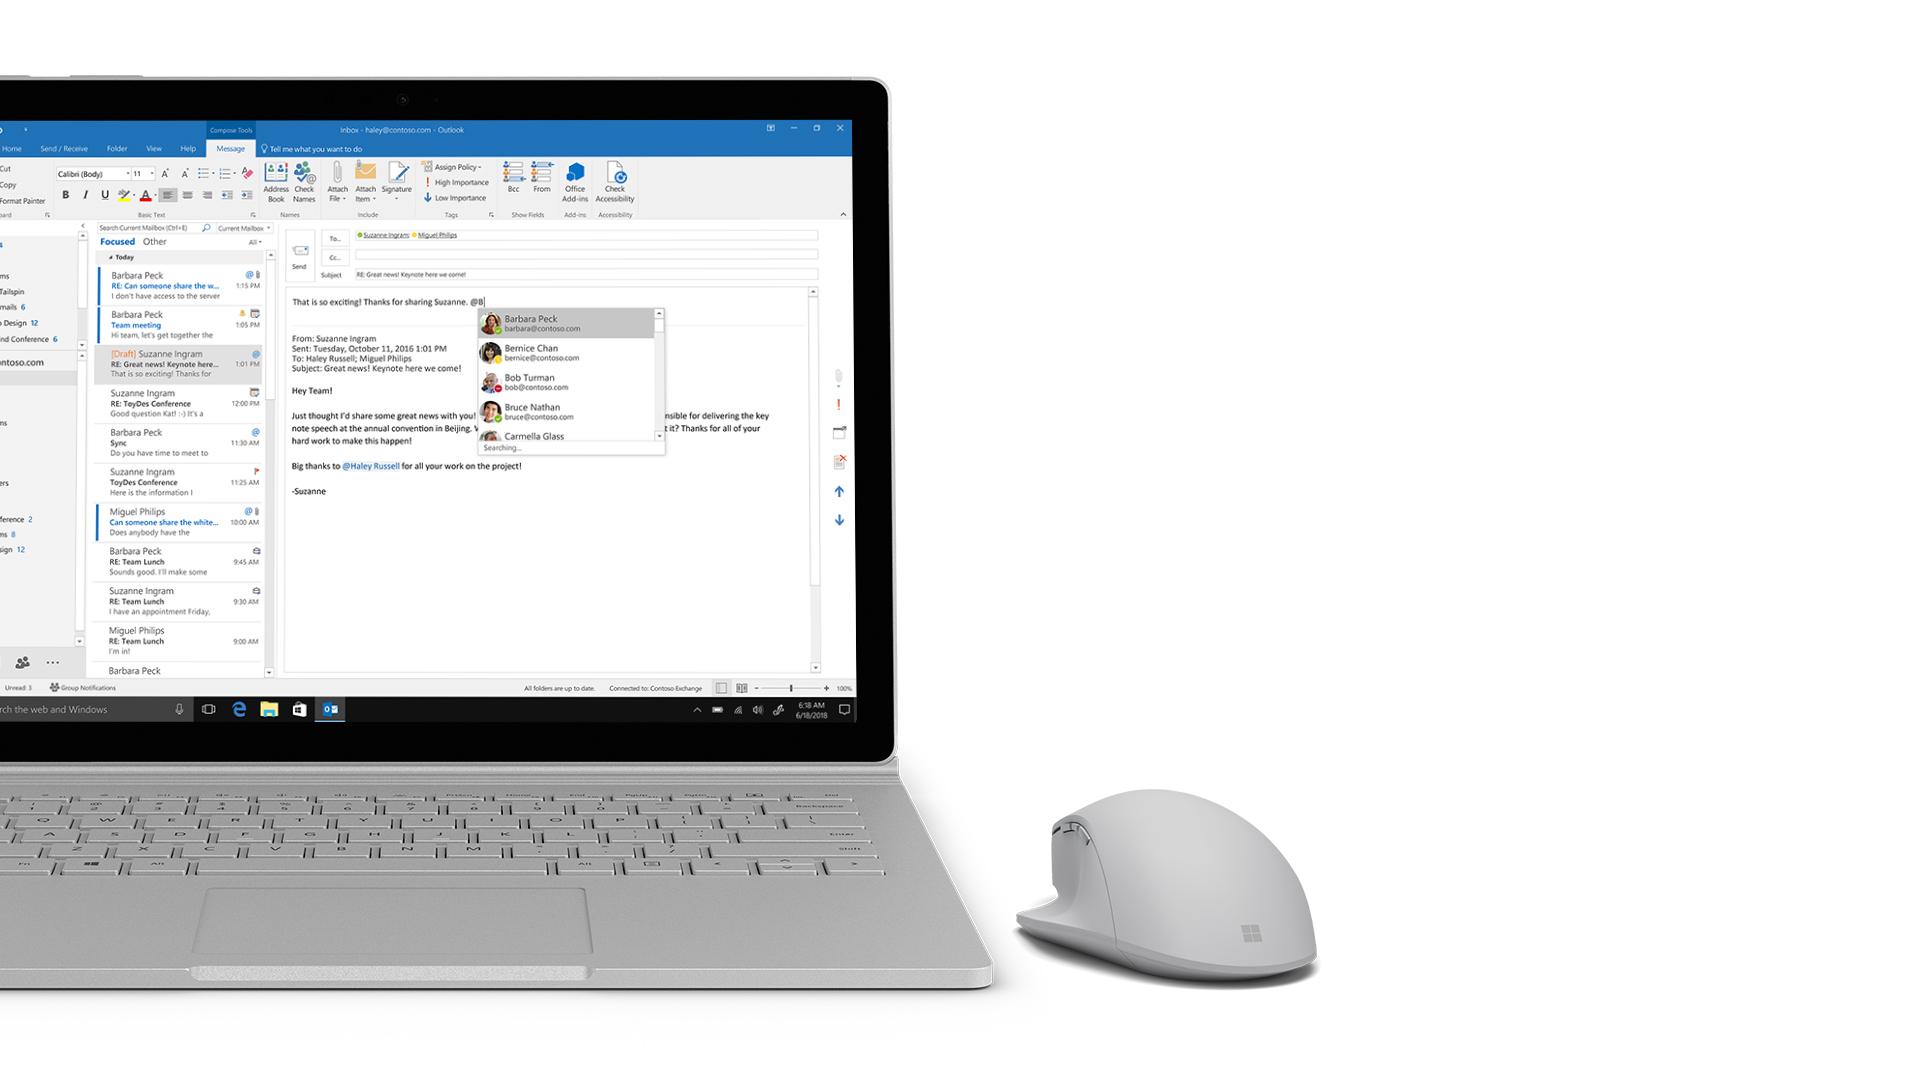 Surface 上の Outlook スクリーンショット。